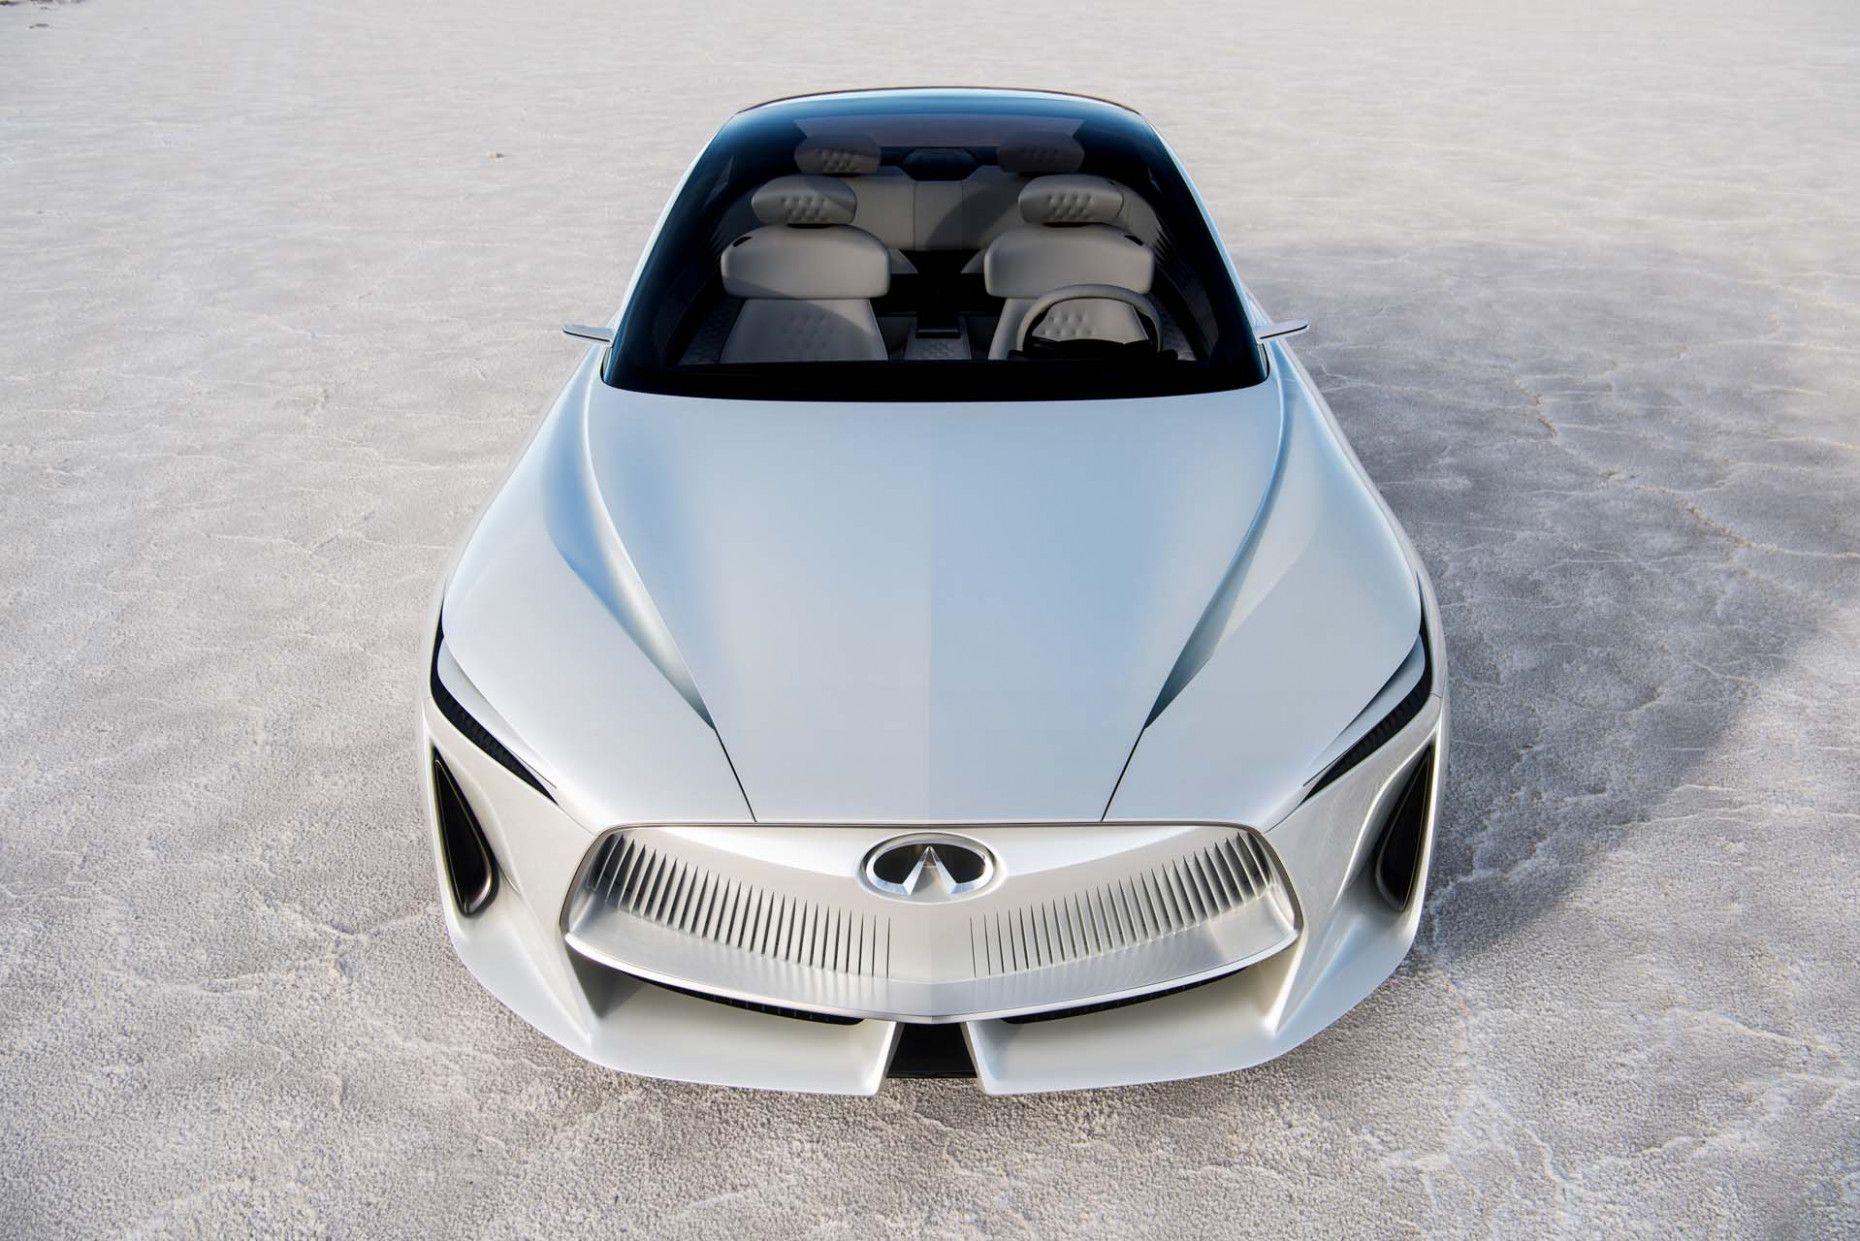 2021 Infiniti Q70 Reviews In 2020 Infiniti Q Concept Cars Infiniti